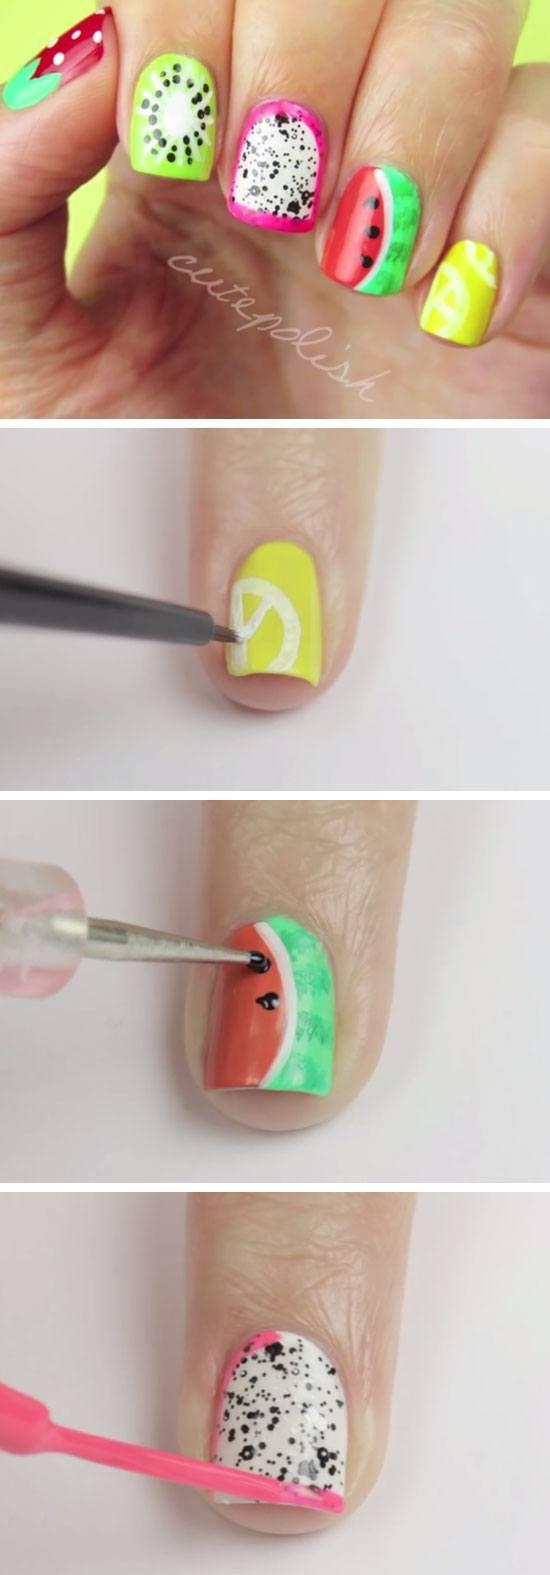 5 Summer Fruit Nail Art Designs | 18 Easy Summer Nails Designs for ...